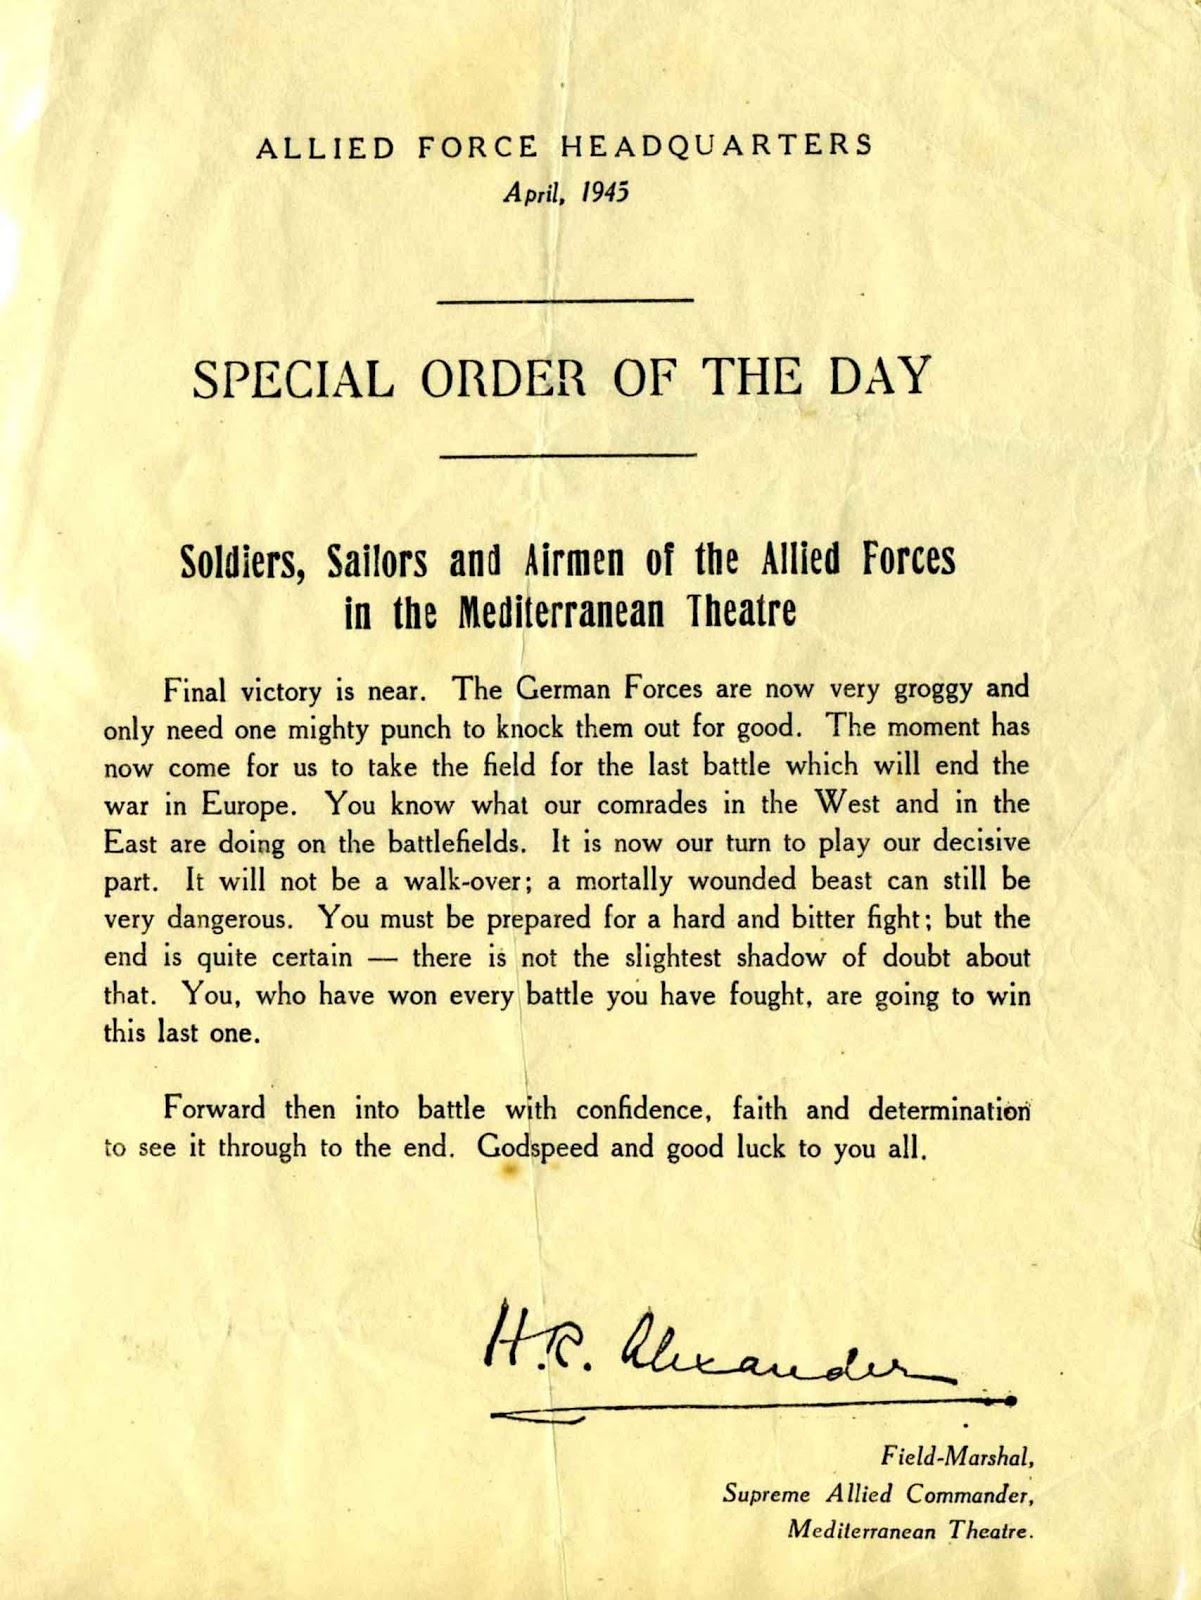 Special order April 1945